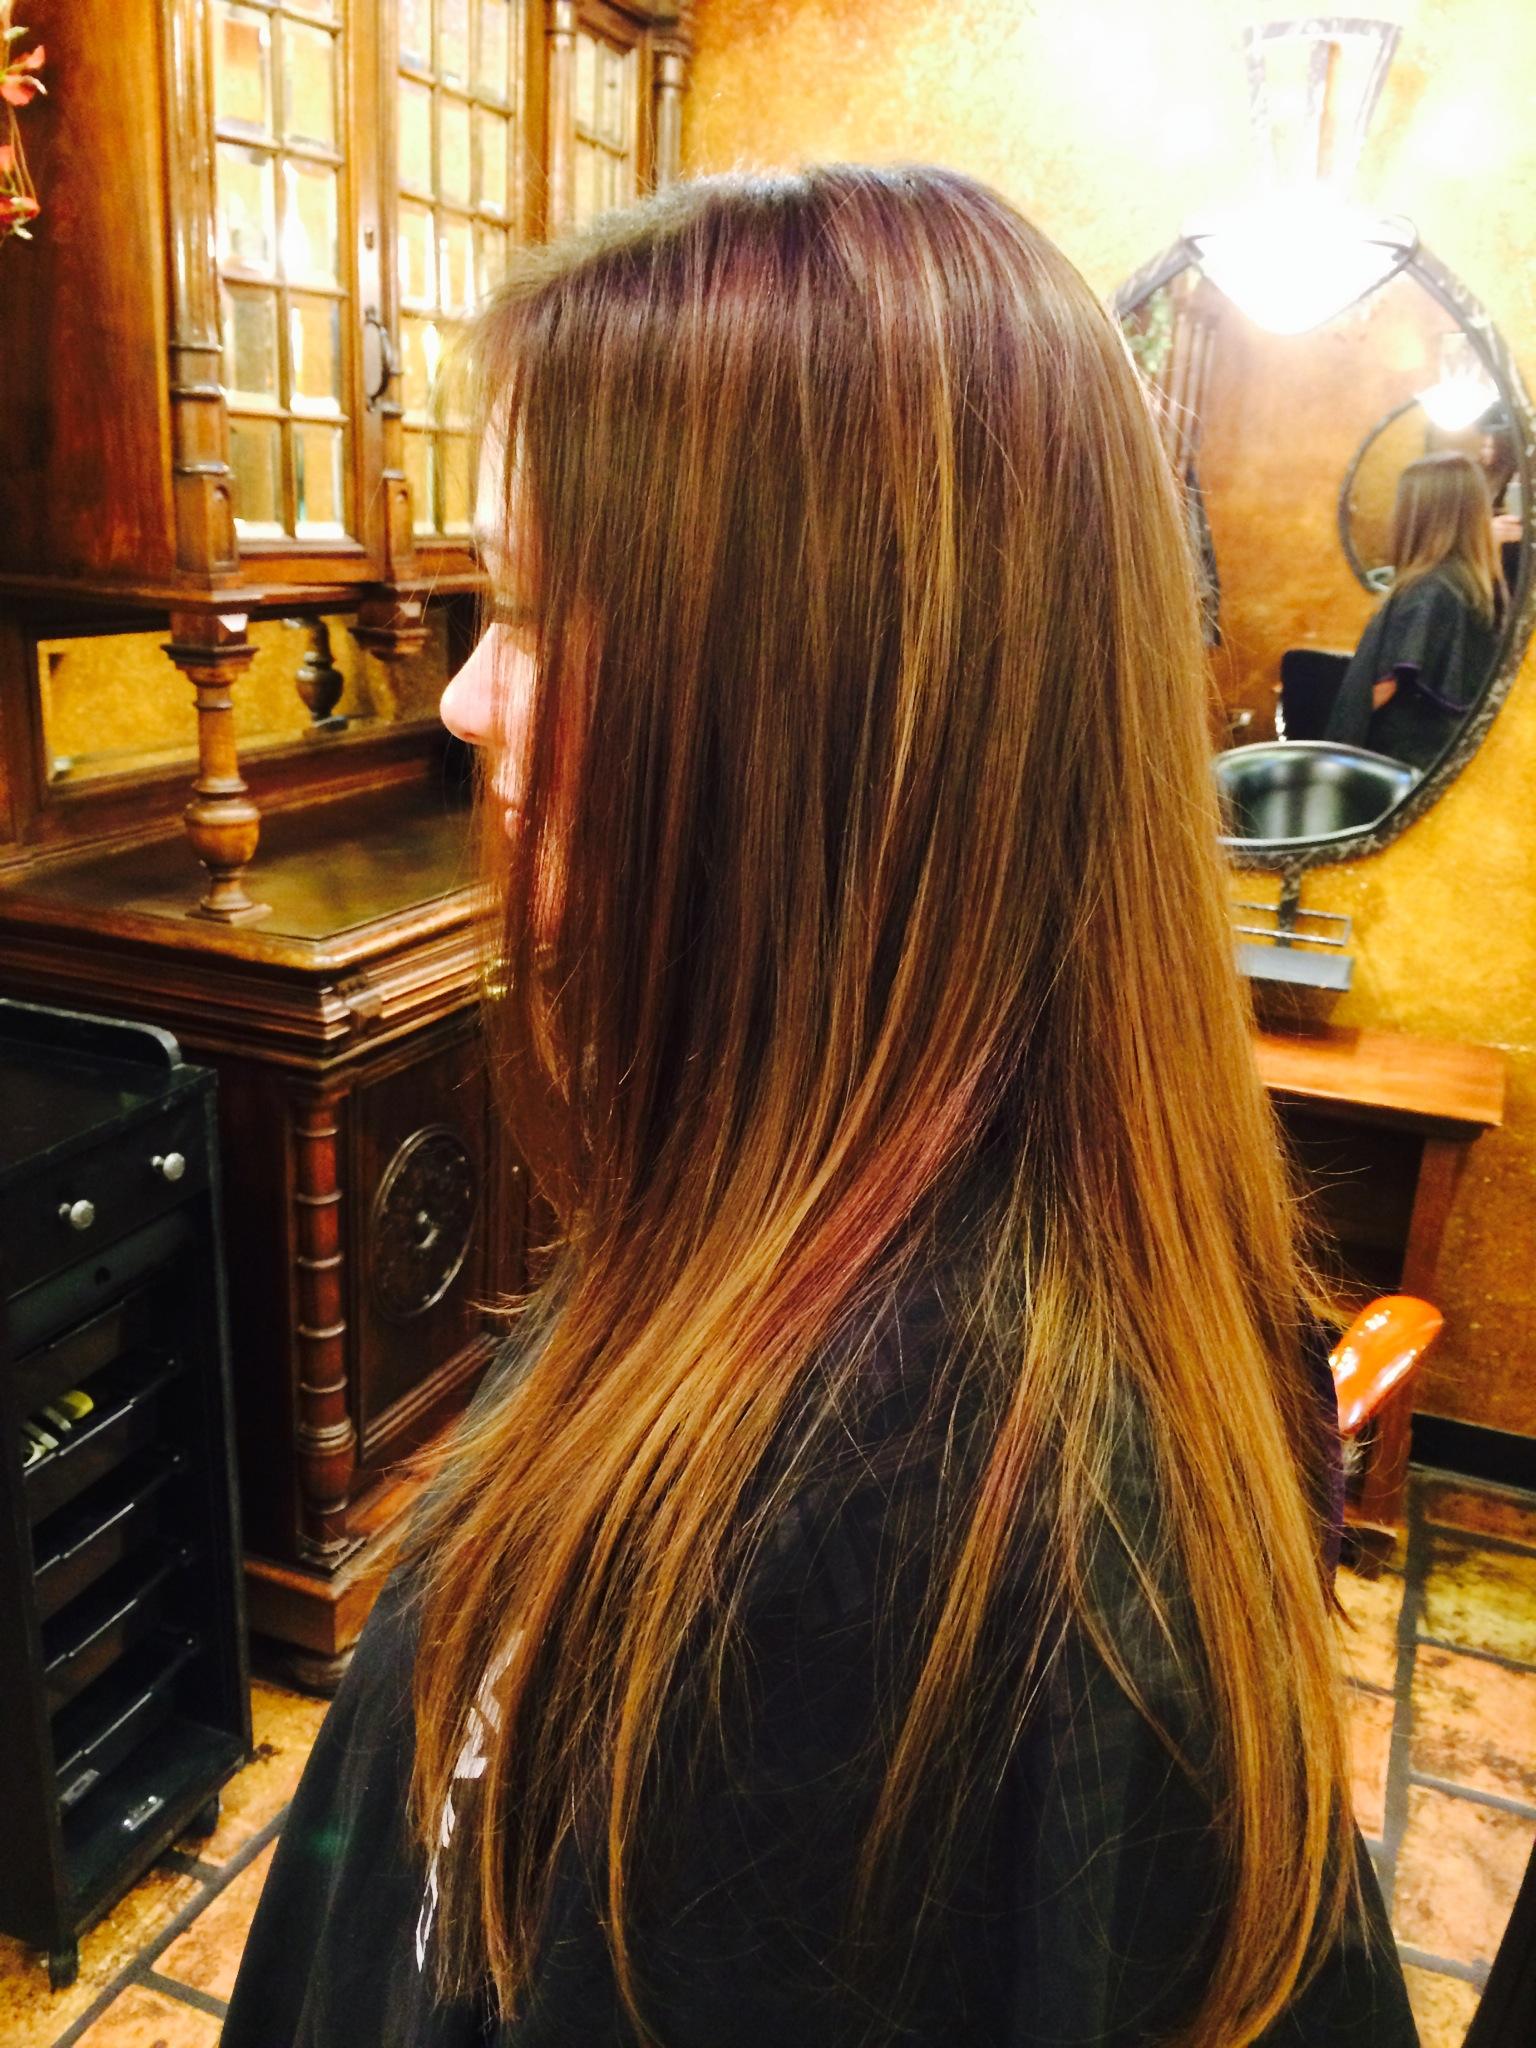 Ombr Sombr Balayage Scottsdale Hair Stylist Jodi Salvatore L